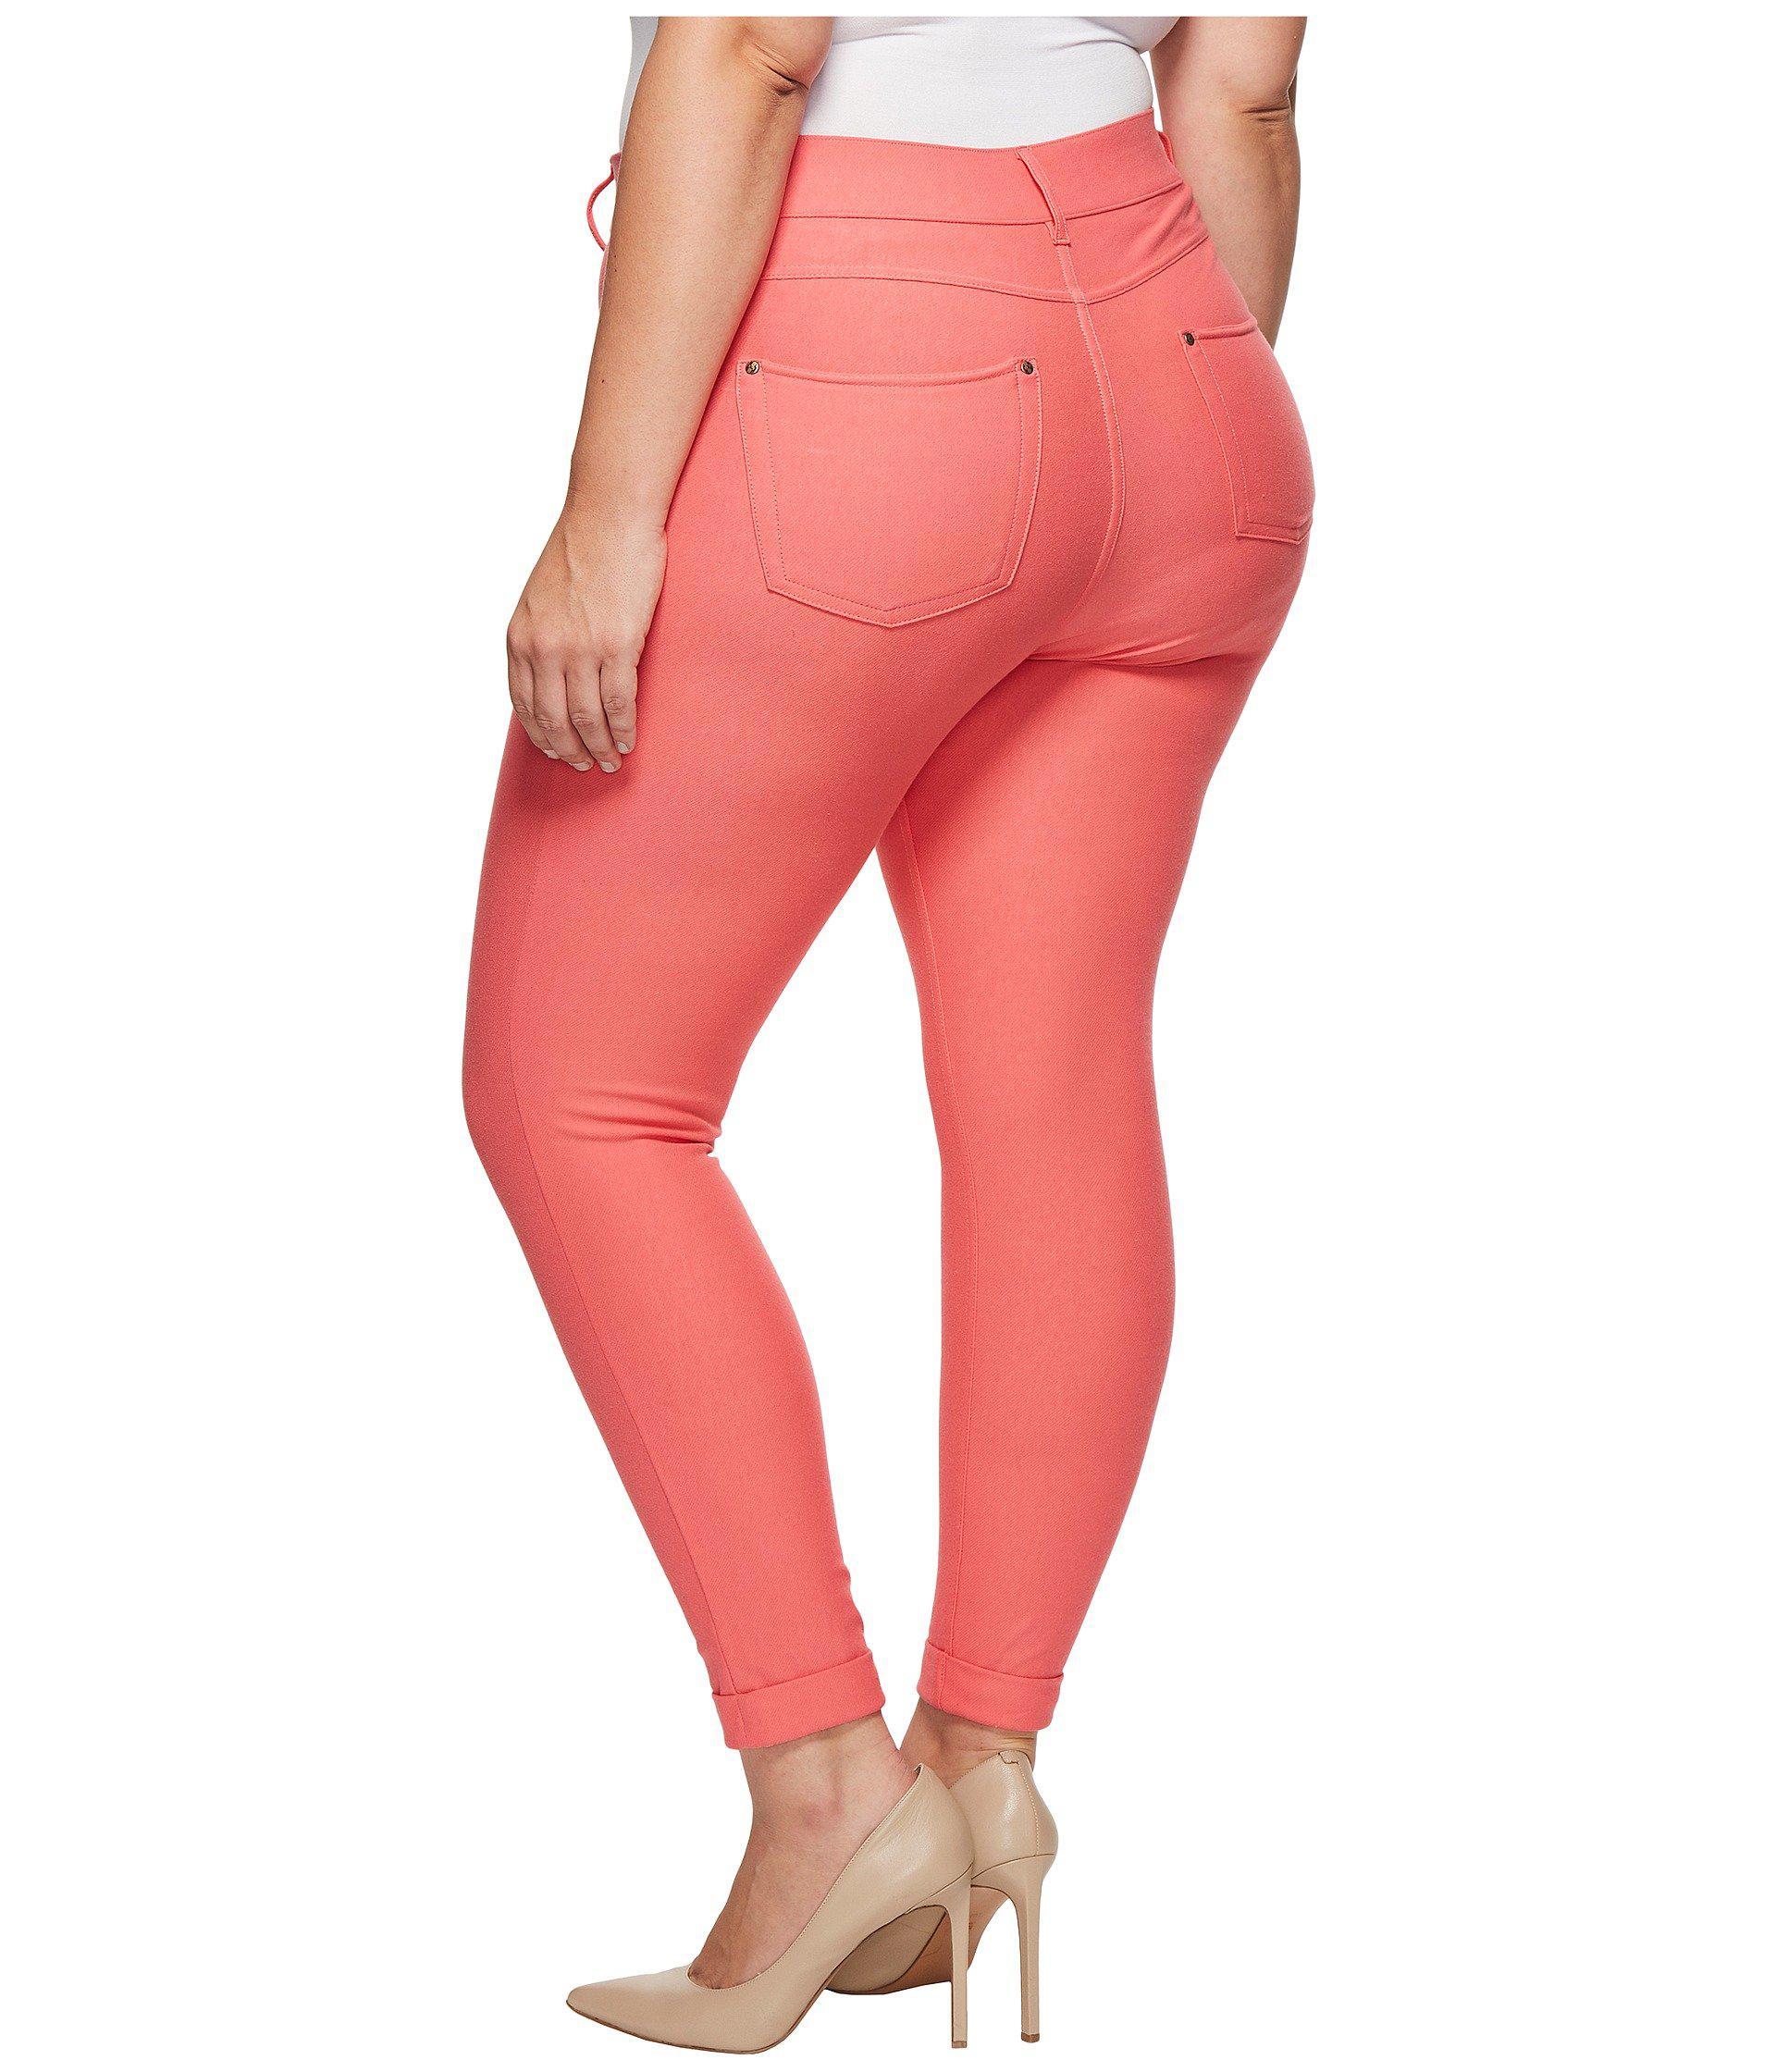 34ba26d47edf Lyst - Hue Plus Size Cuffed Essential Denim Skimmer in Pink - Save 24%